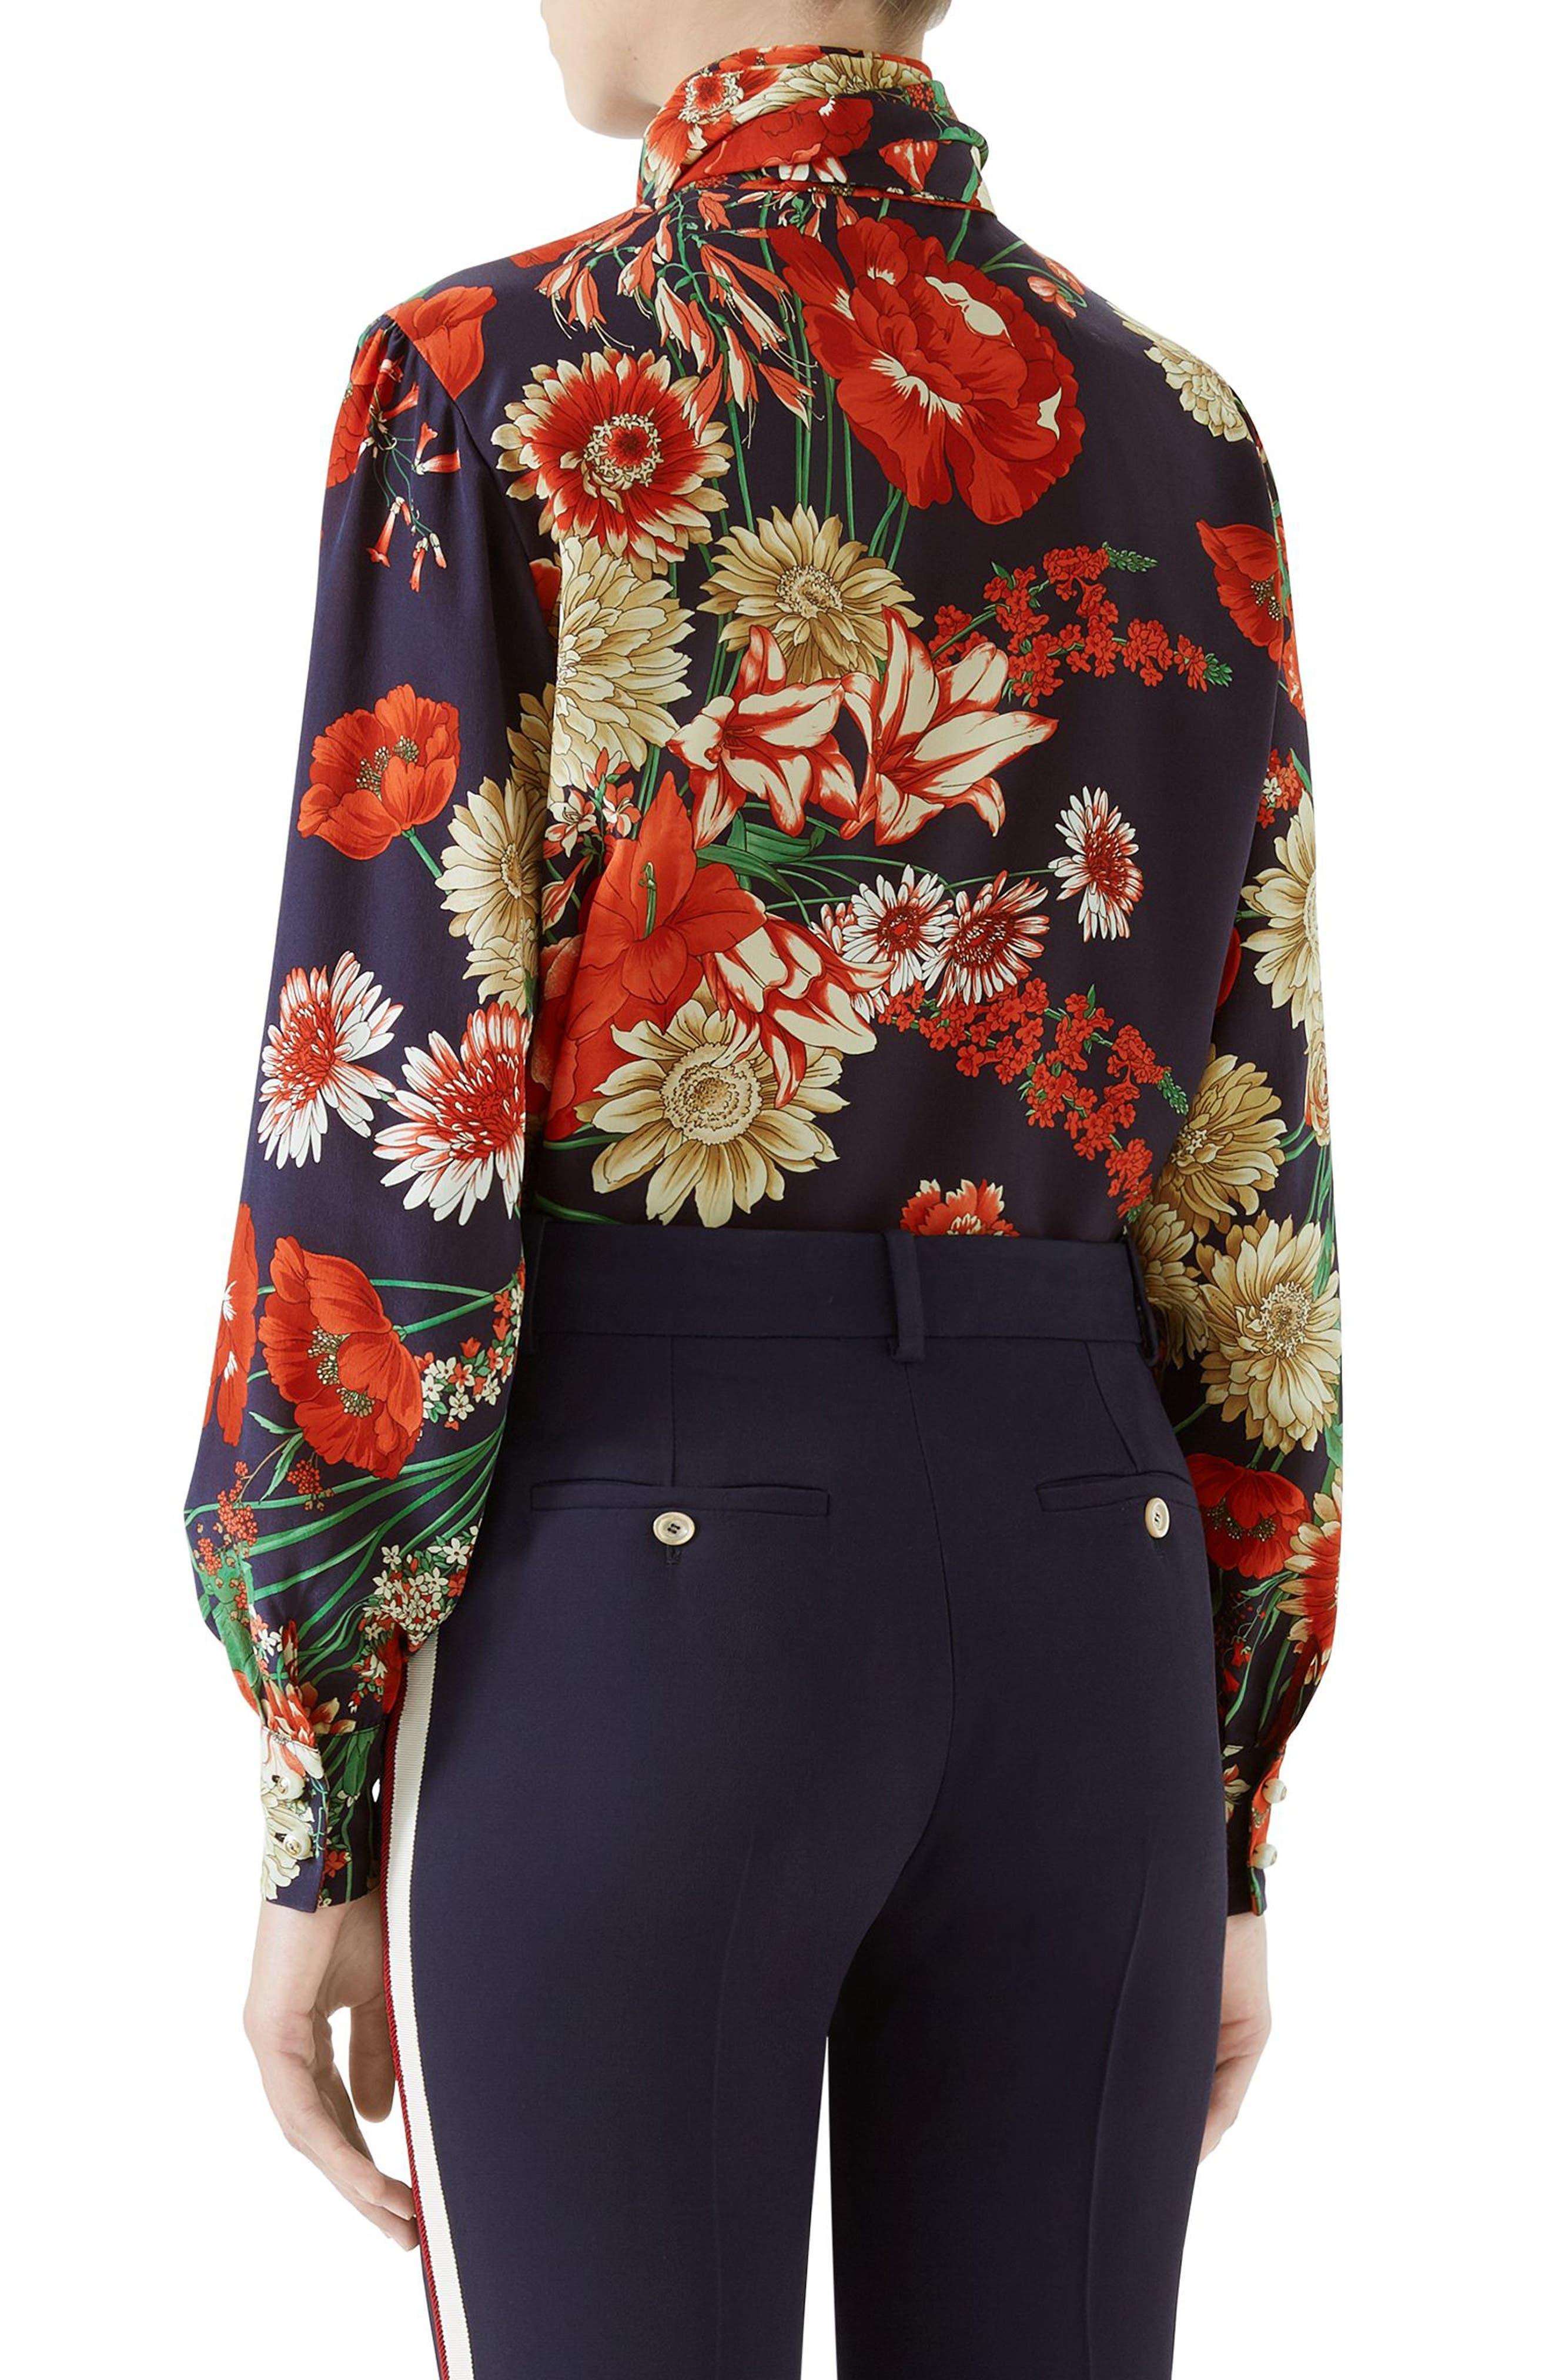 Spring Bouquet Print Tie Neck Silk Blouse,                             Alternate thumbnail 2, color,                             Blue/ Red Print